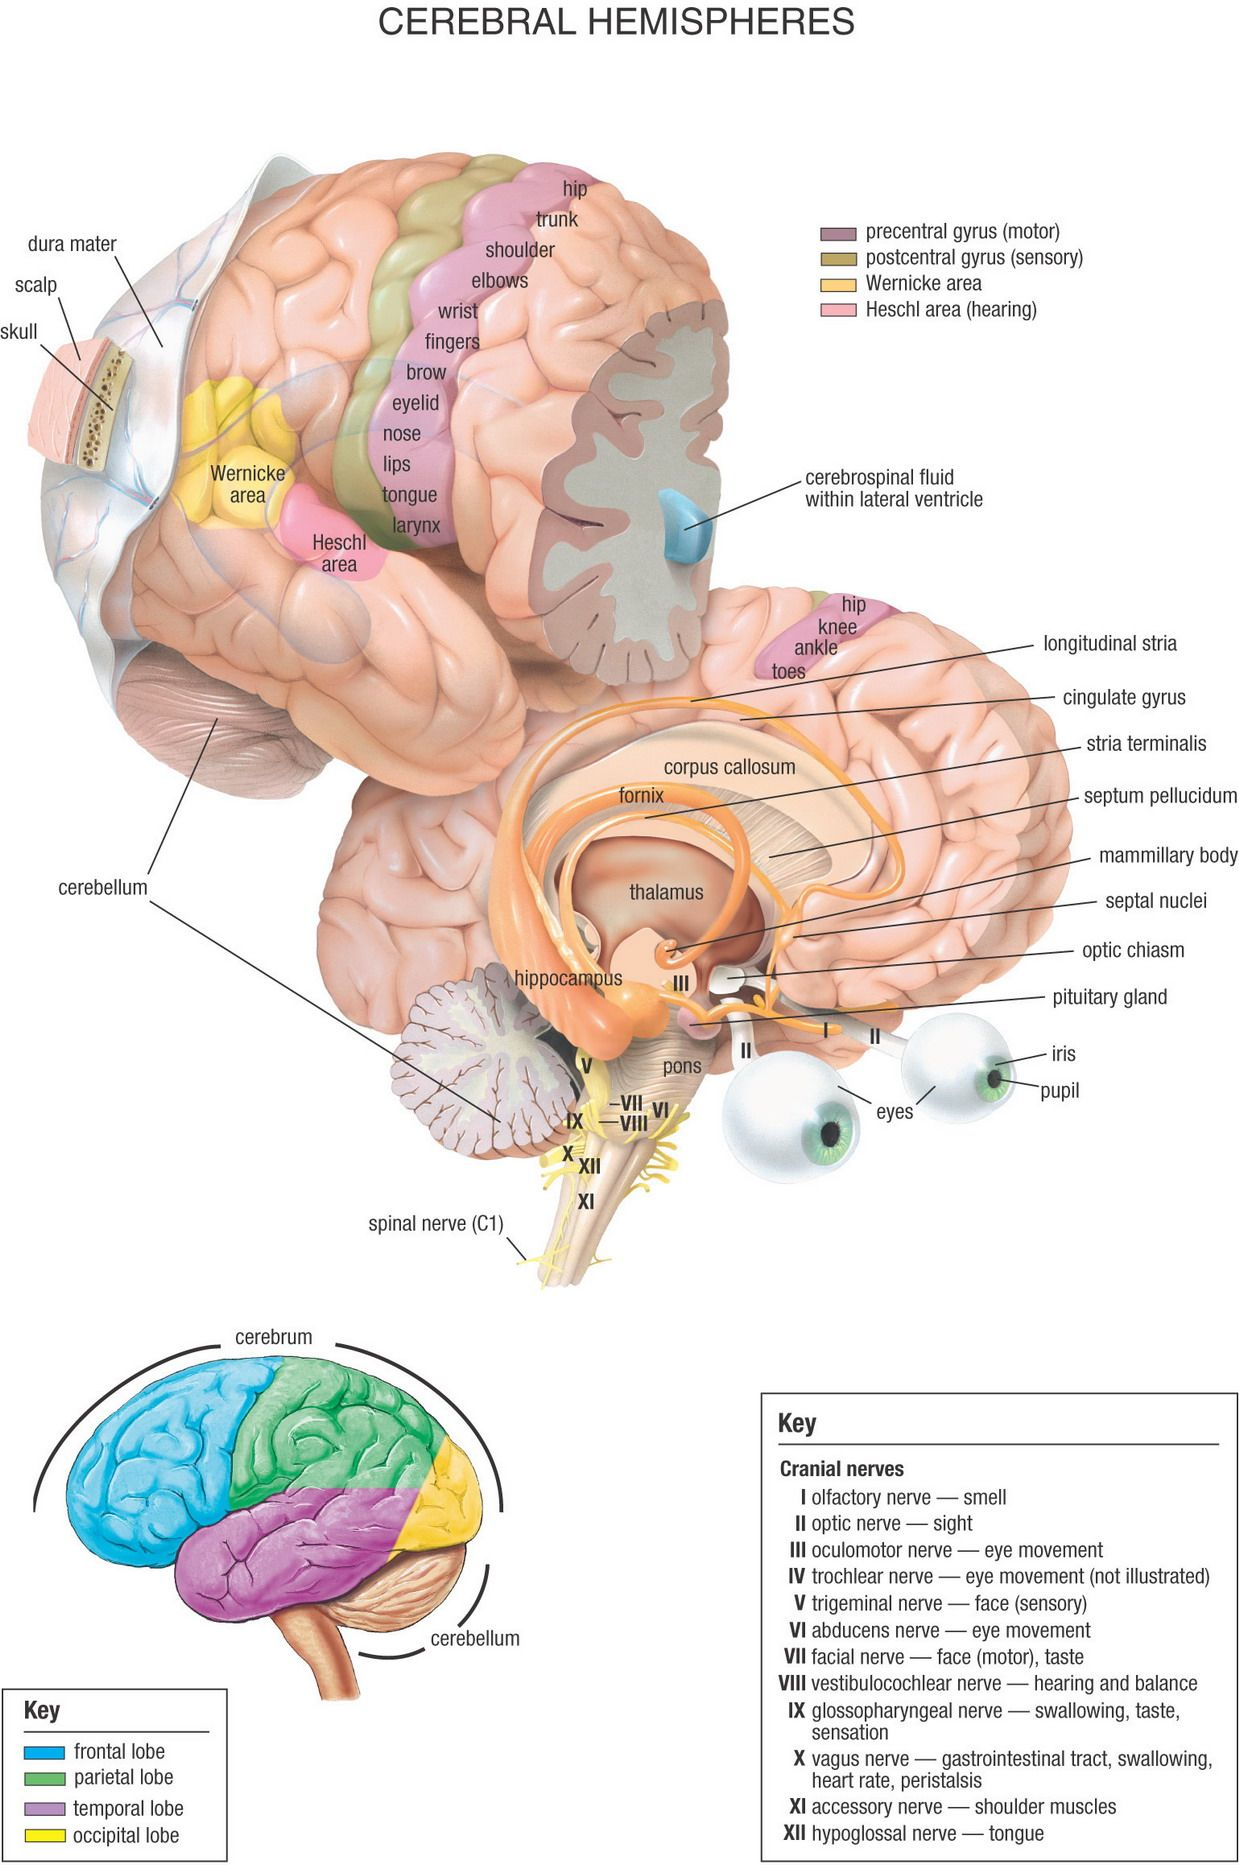 05_Cerebral_Hemispheres.jpg 1,239×1,865 pixels | Nursing | Pinterest ...